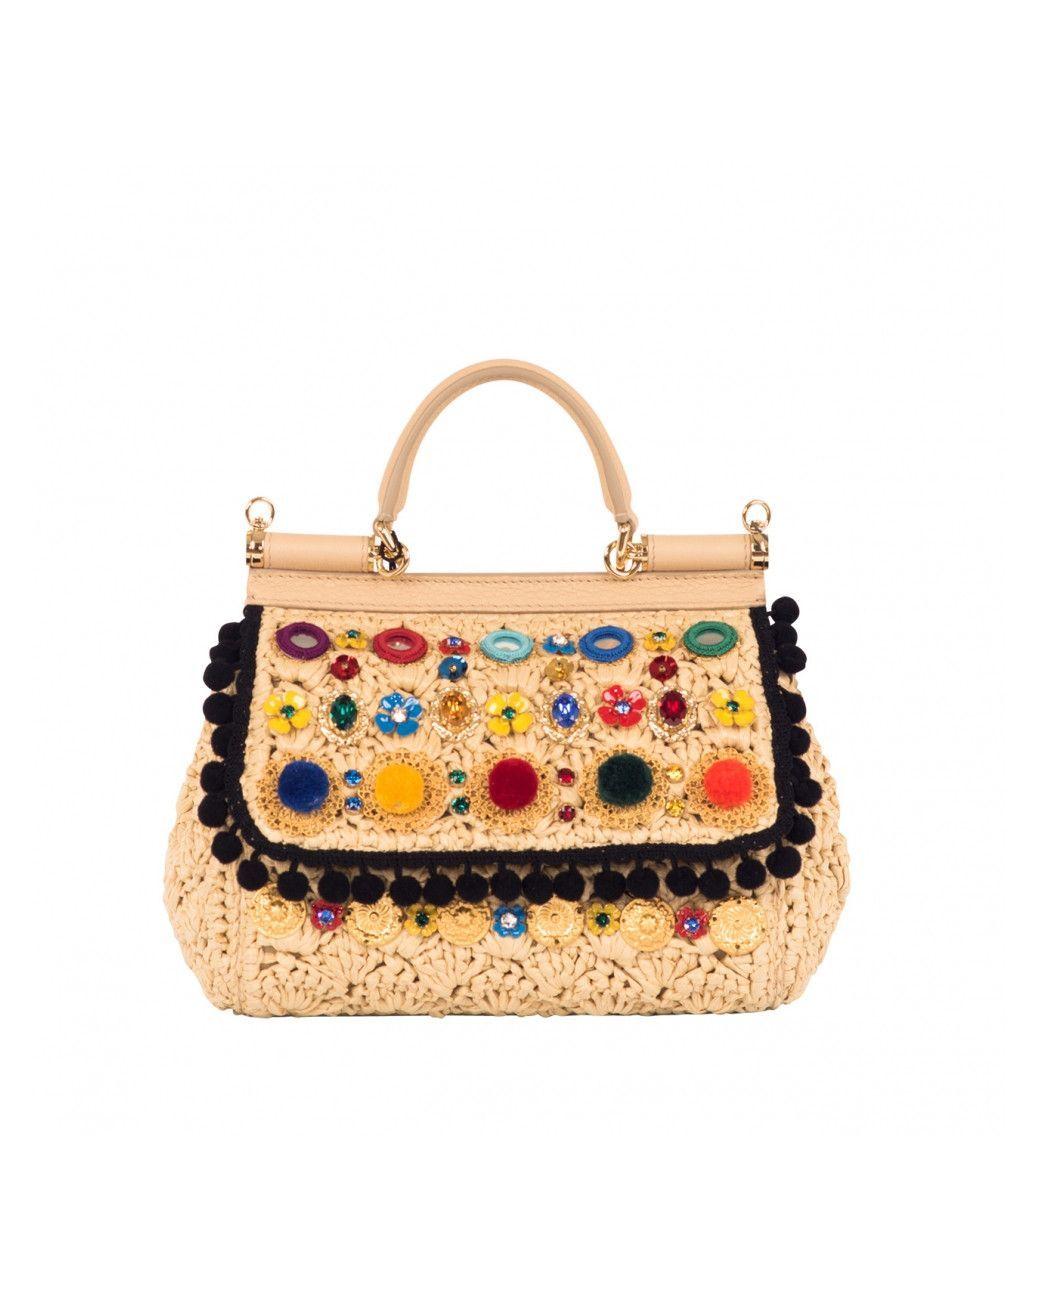 0568af45a889 Dolce   Gabbana